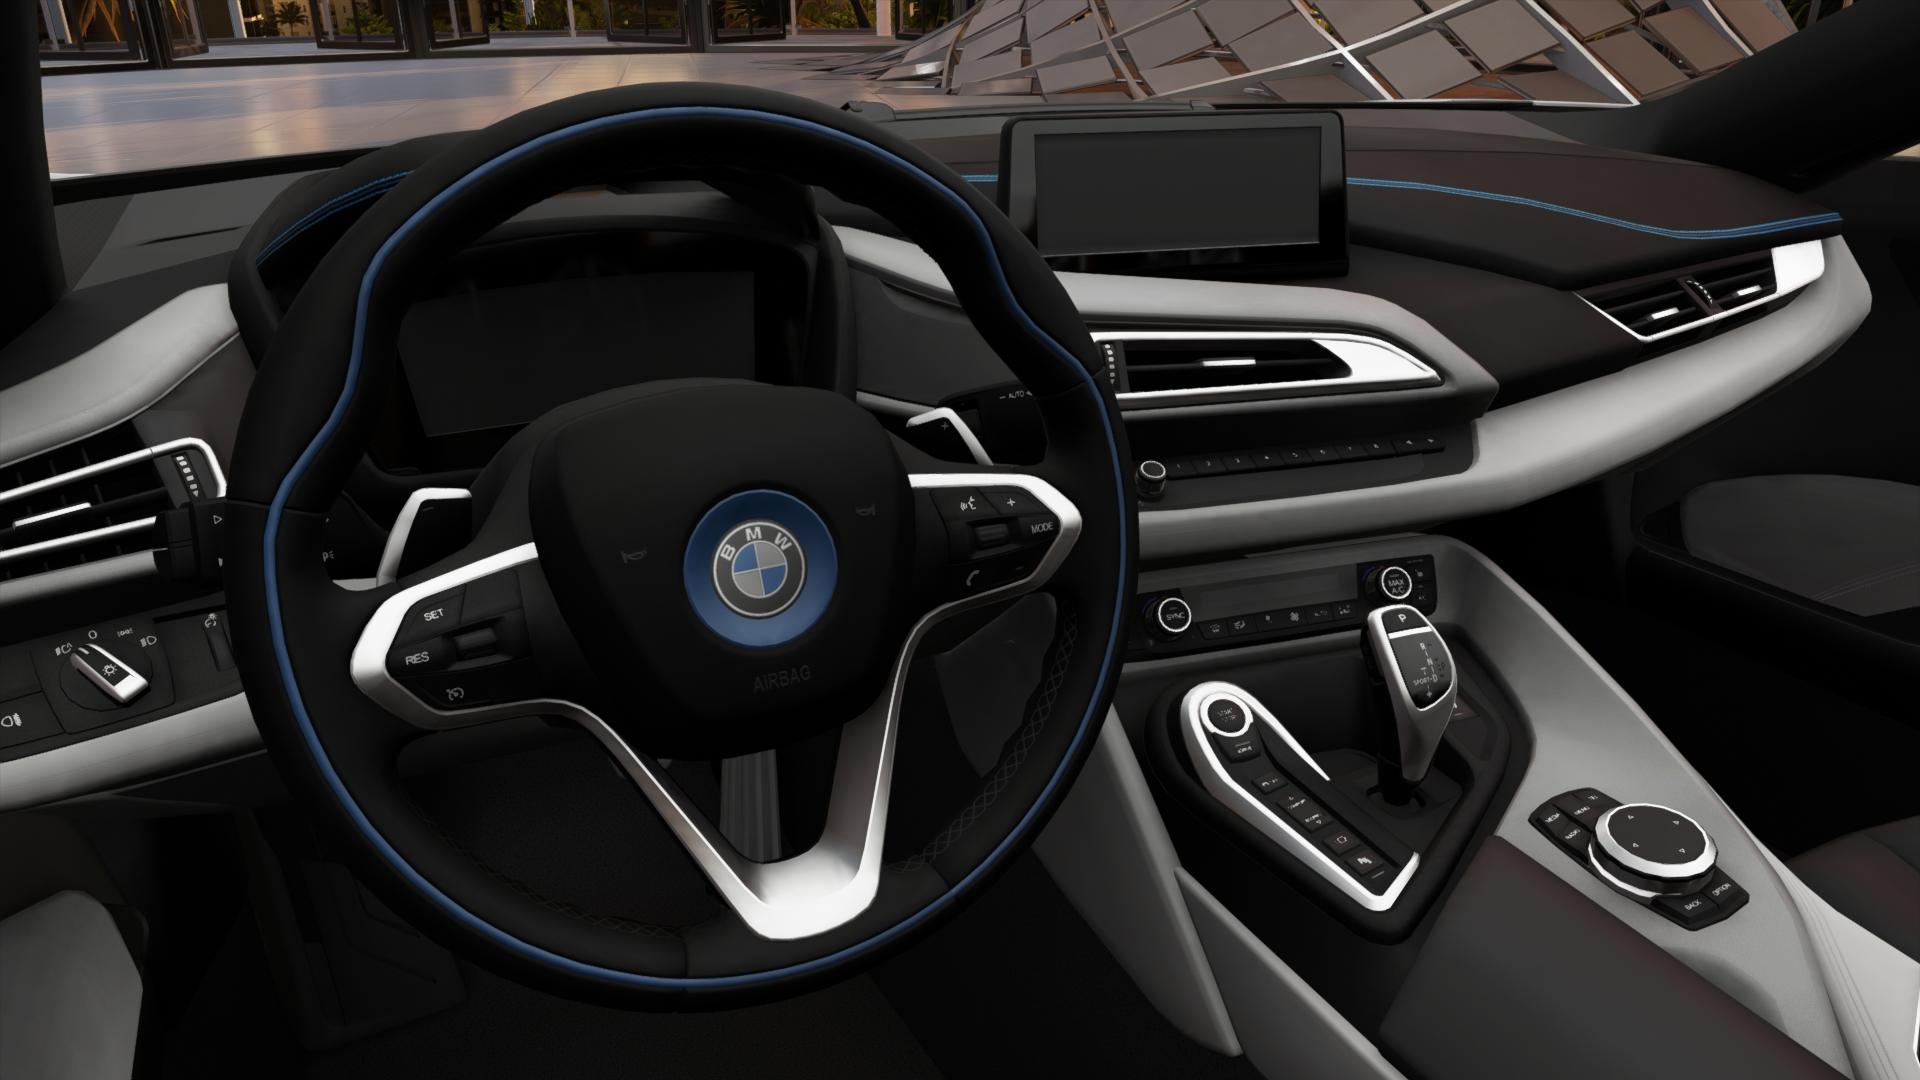 Image Fh3 Bmw I8 Interior Jpg Forza Motorsport Wiki Fandom